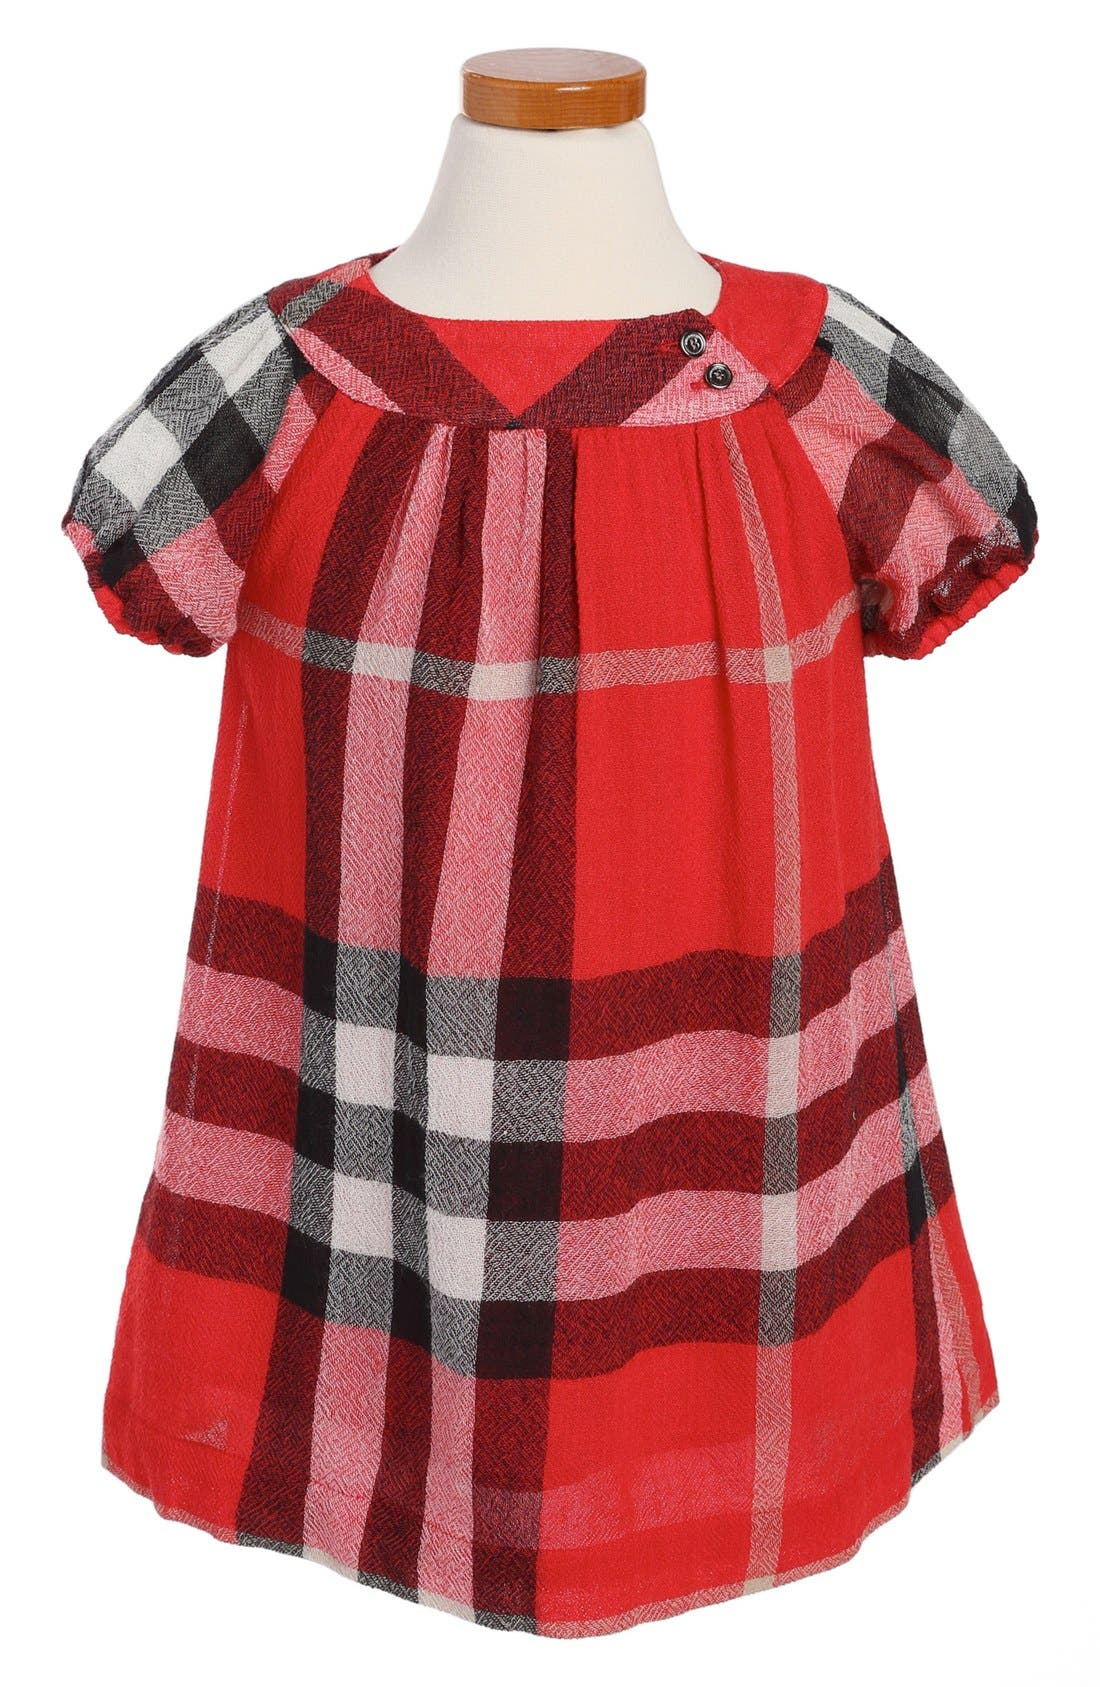 Main Image - Burberry 'Delany' Dress (Toddler Girls)